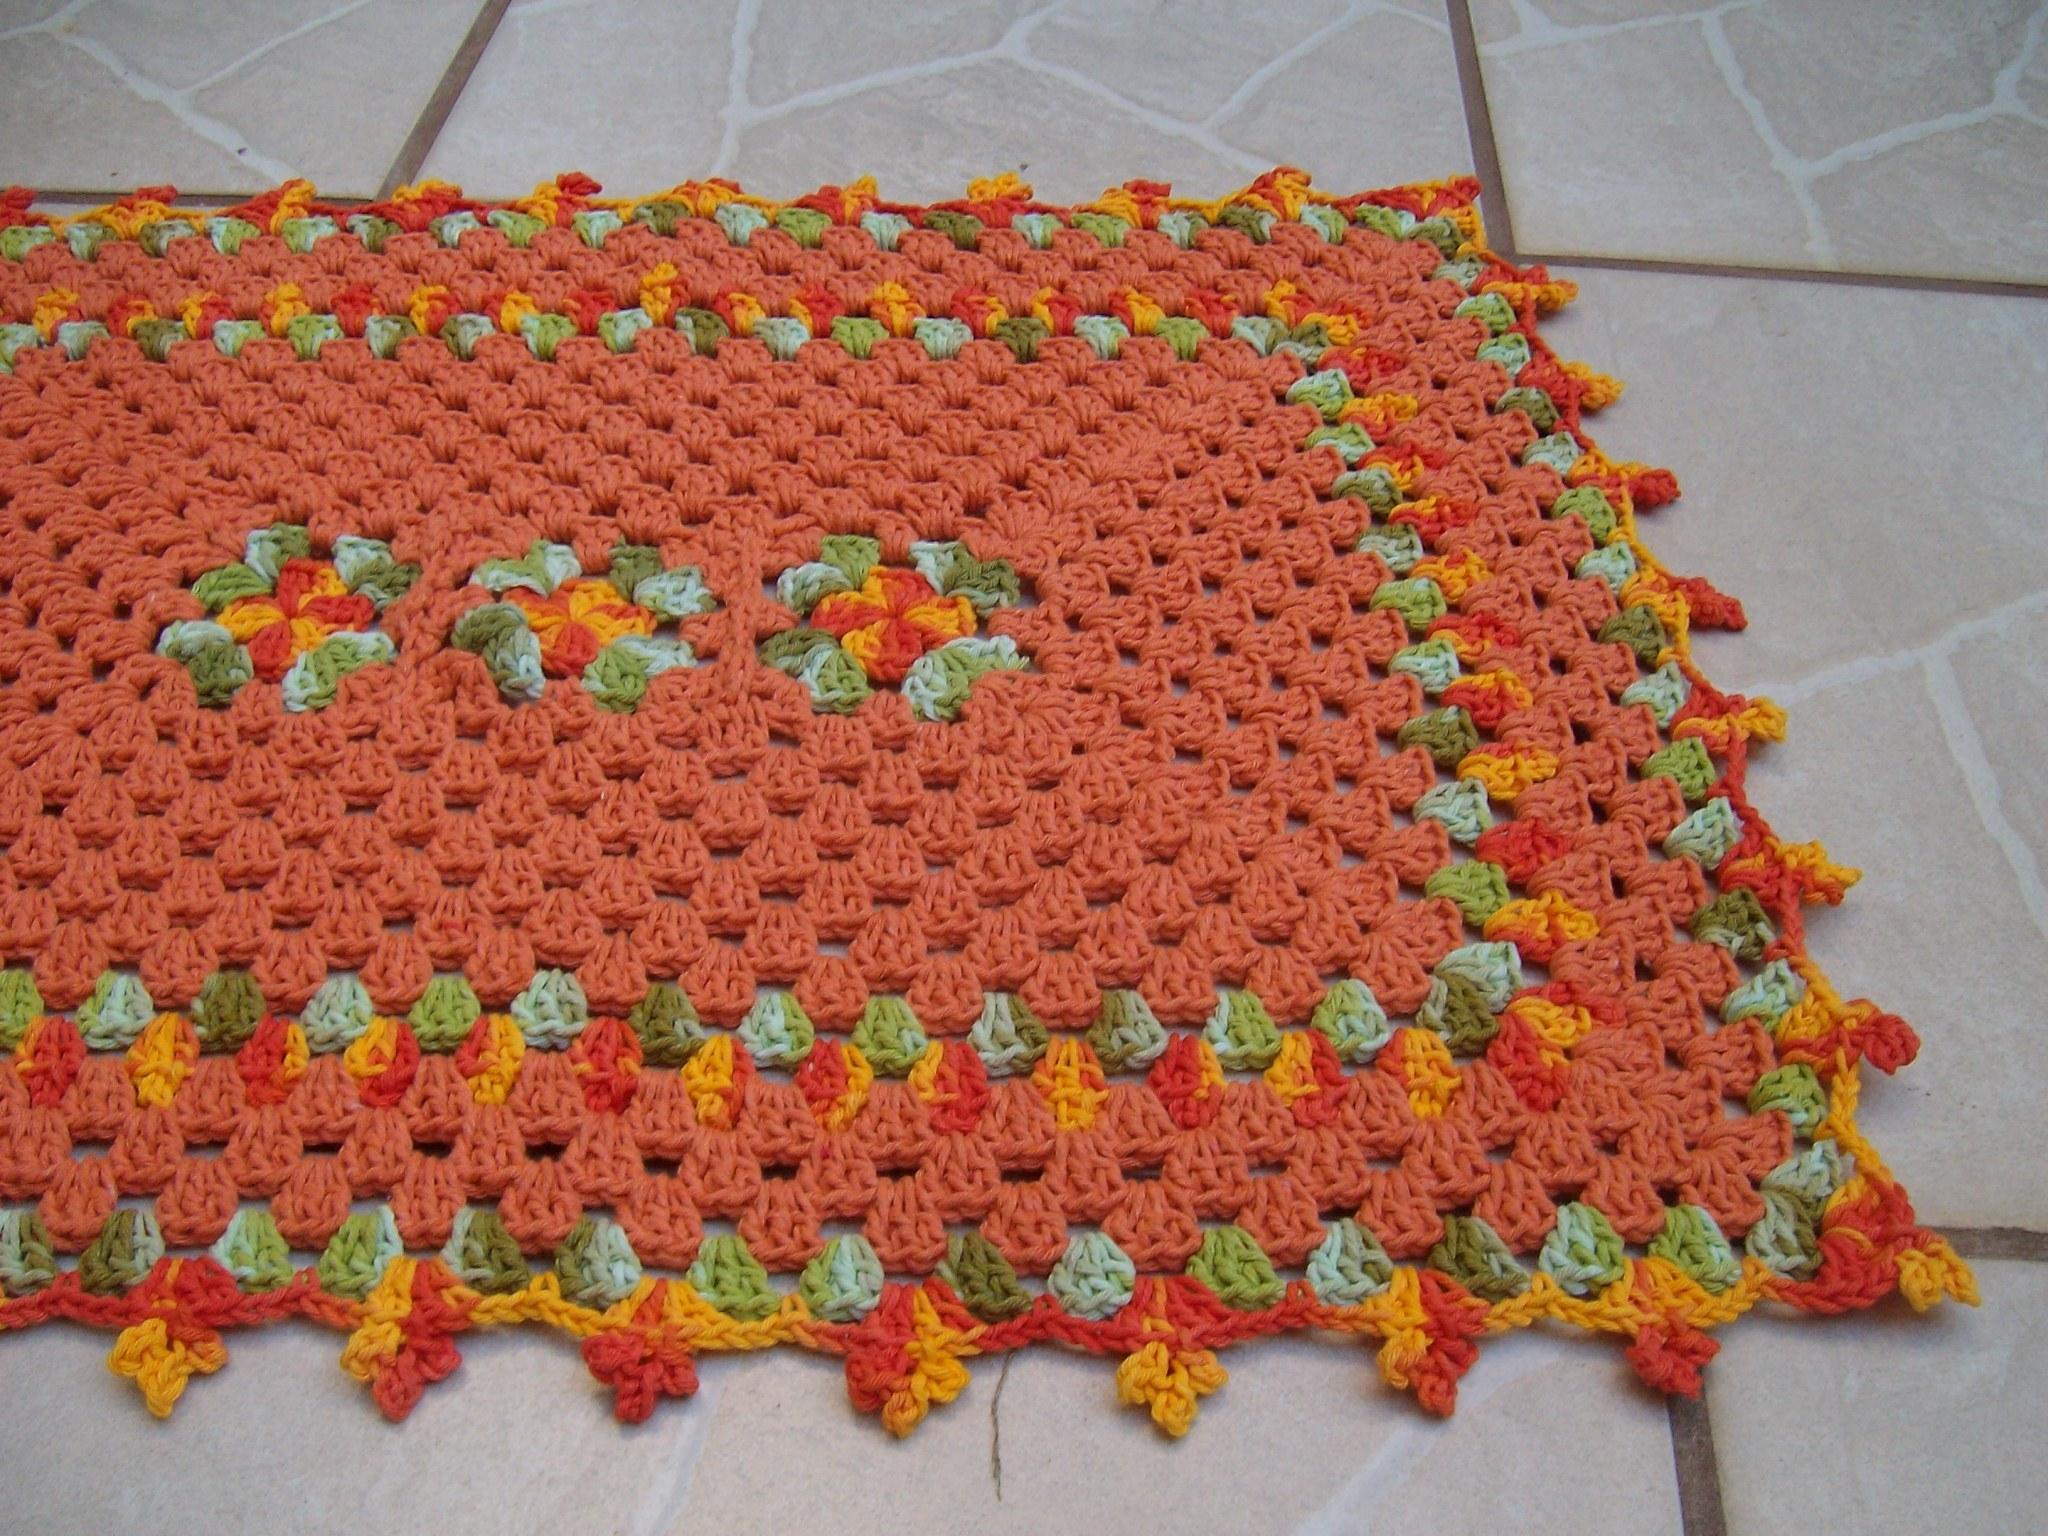 fotos de tapetes de barbantes com flor redondo simples oval fotos #8D3824 2048 1536